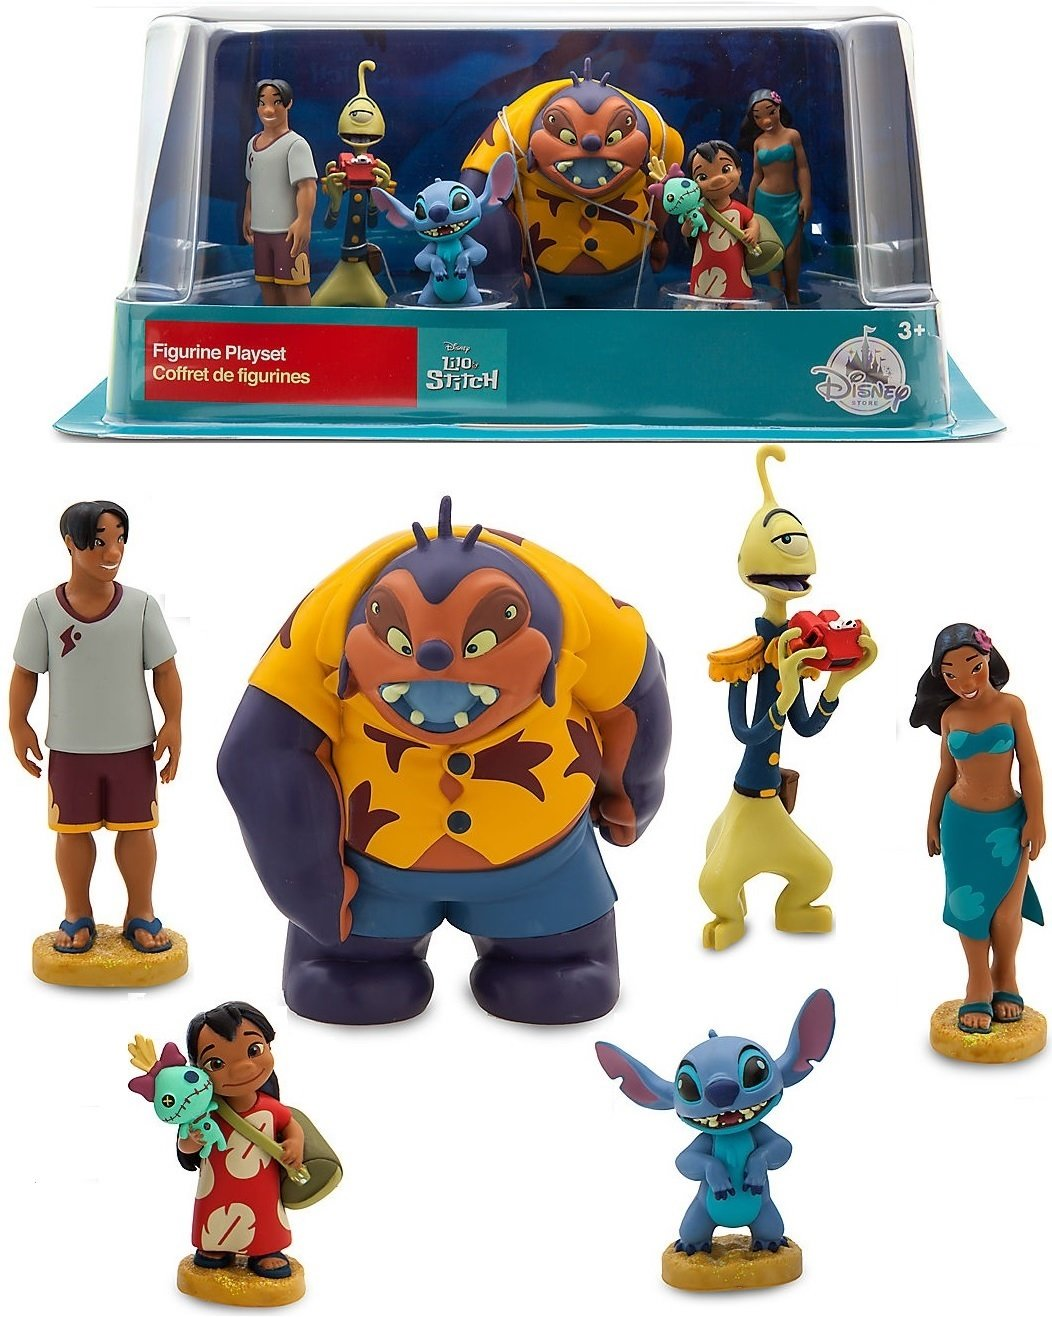 Disney LILO & STITCH FIGURINE PLAYSET Cake Toppers Set of 6 pvc doll Figures